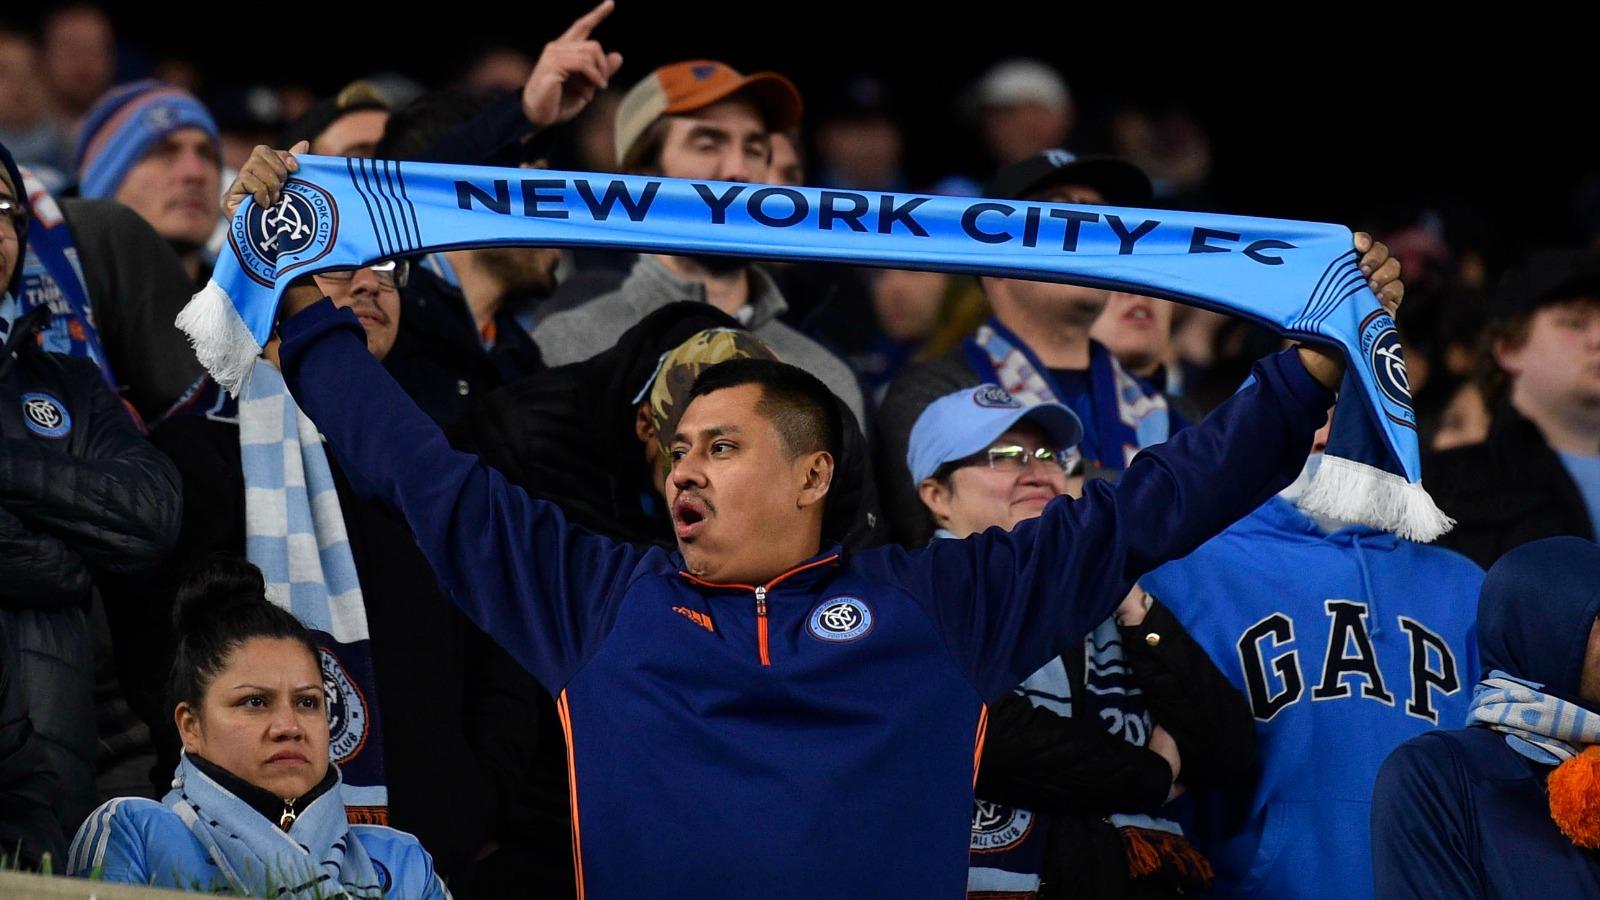 020717-NYCFC-fan